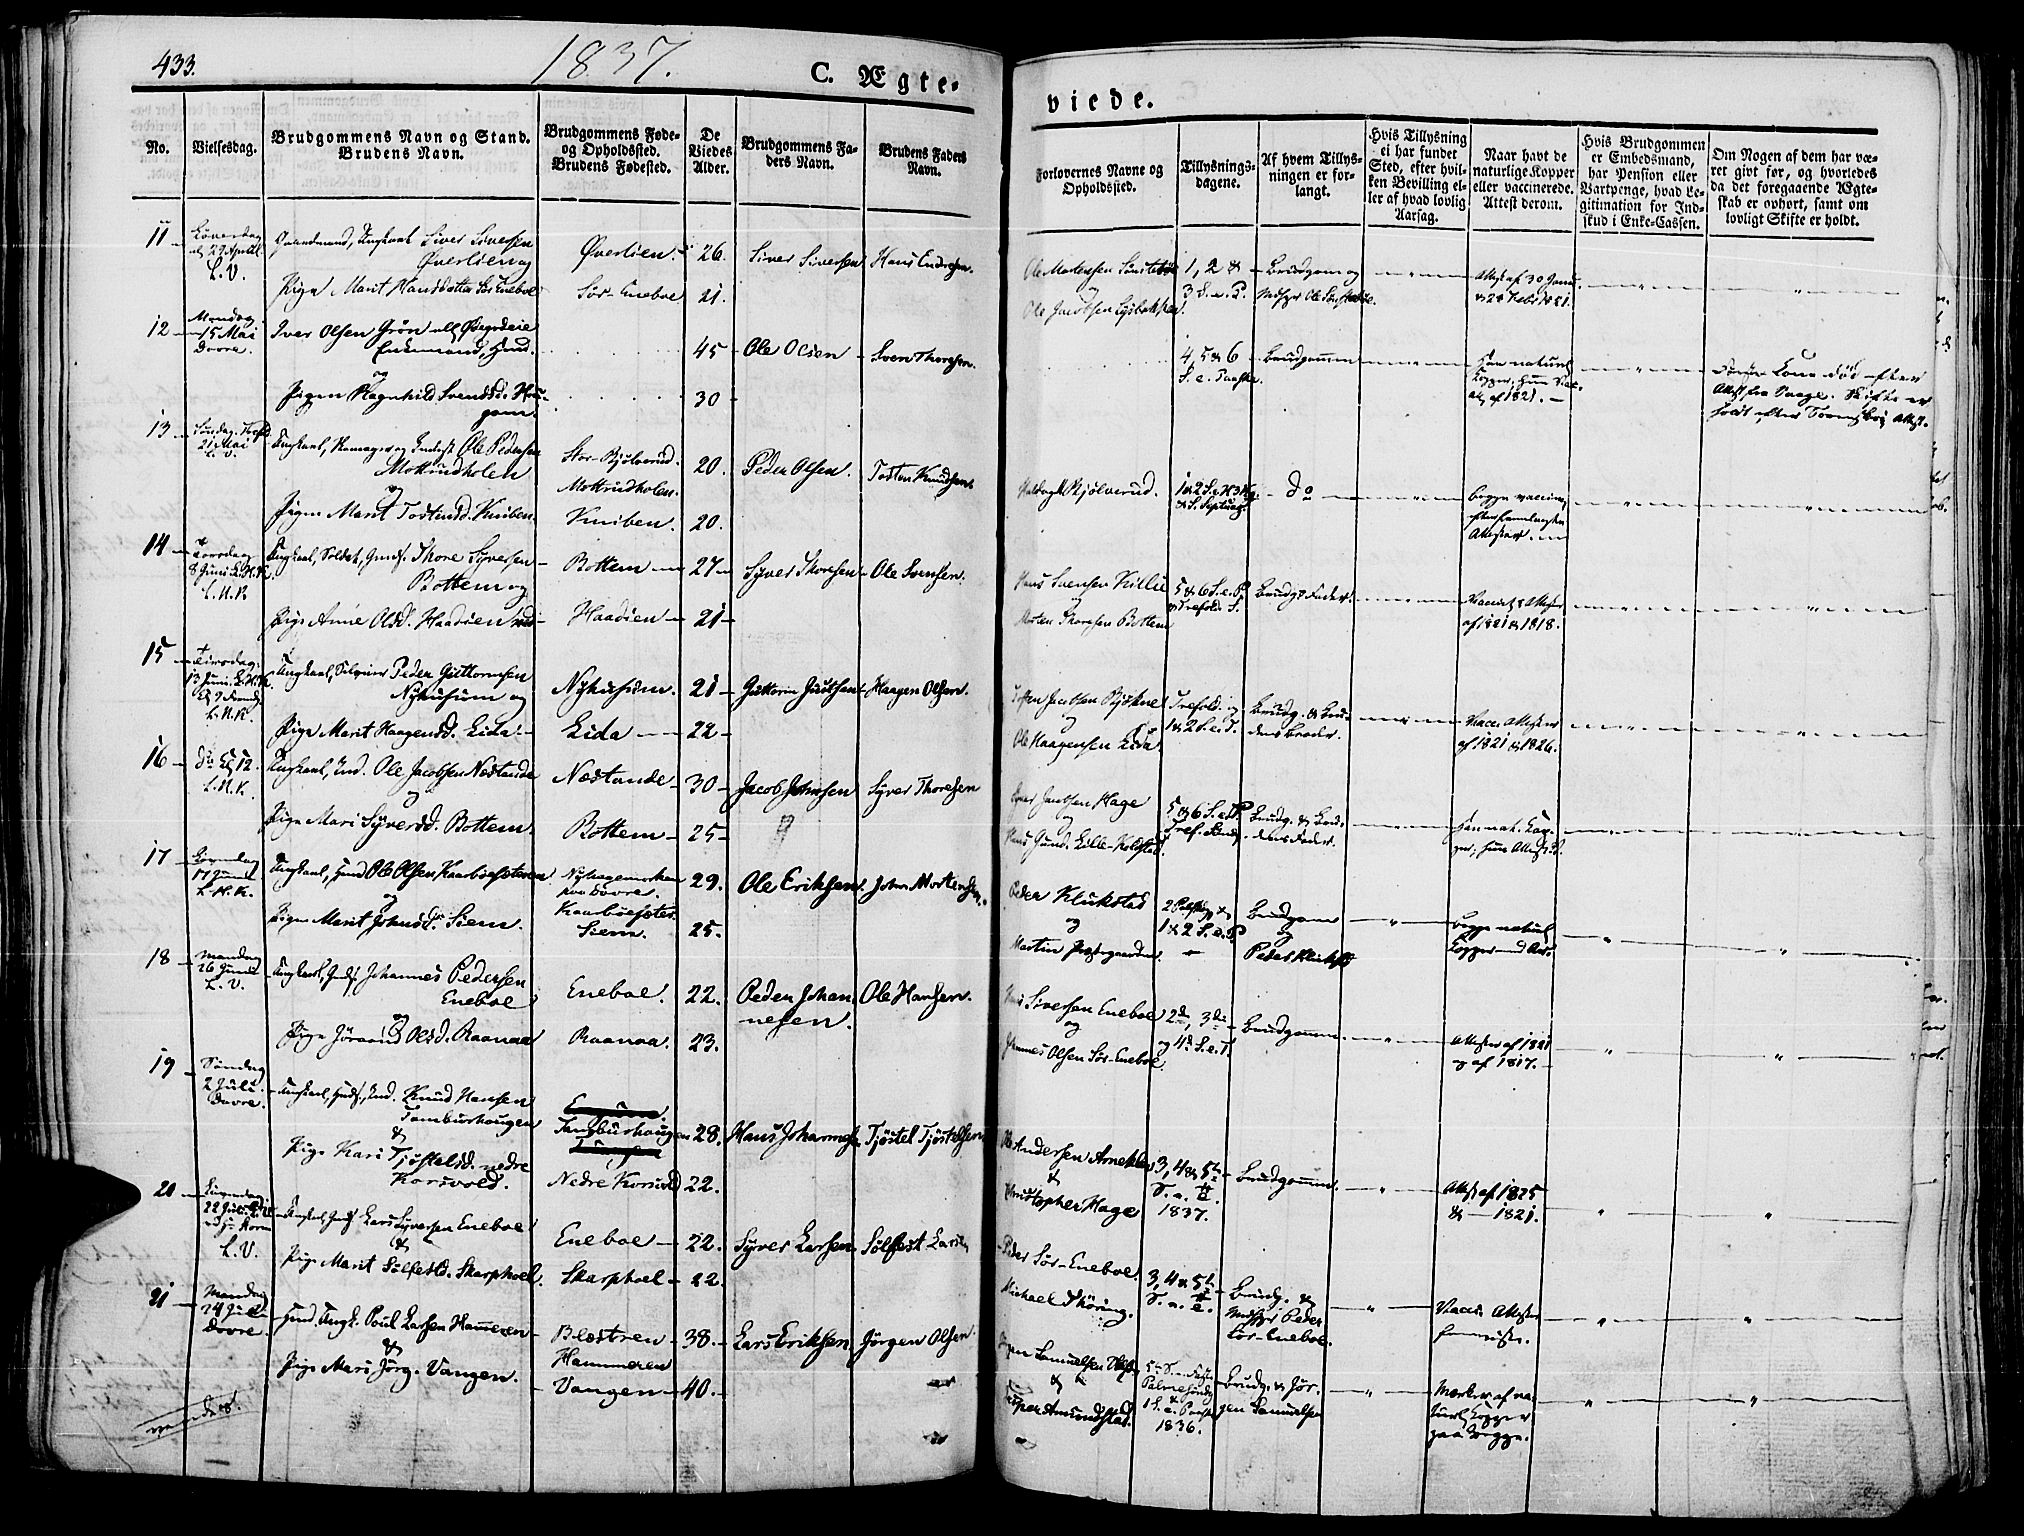 SAH, Lesja prestekontor, Ministerialbok nr. 5, 1830-1842, s. 433